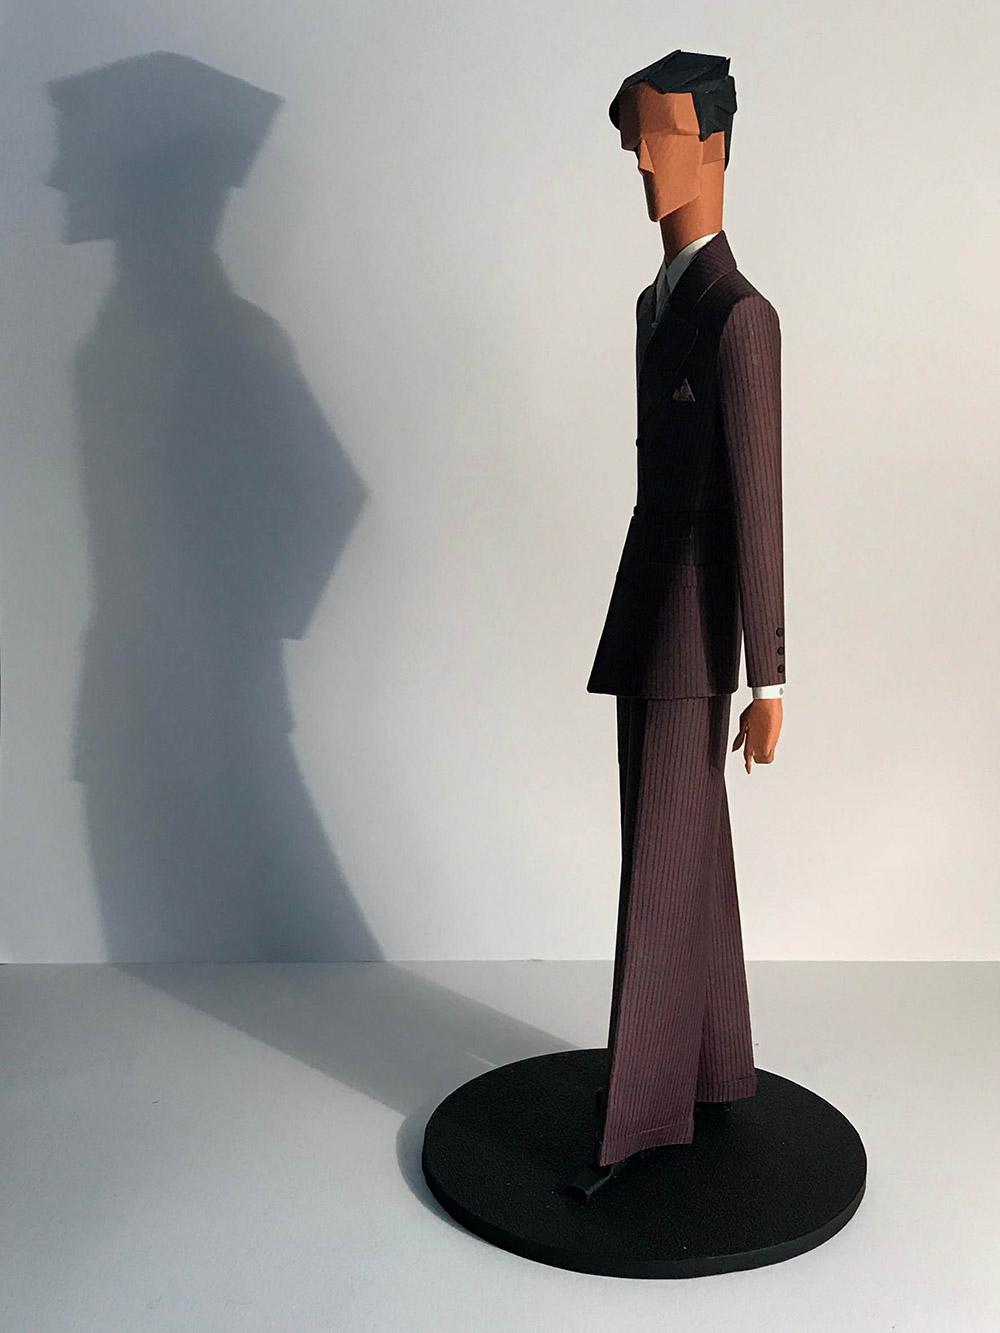 2-saint-aubin-Elegant-au-costume-bordeaux-b-galerie-bettina-art-contemporain-paris